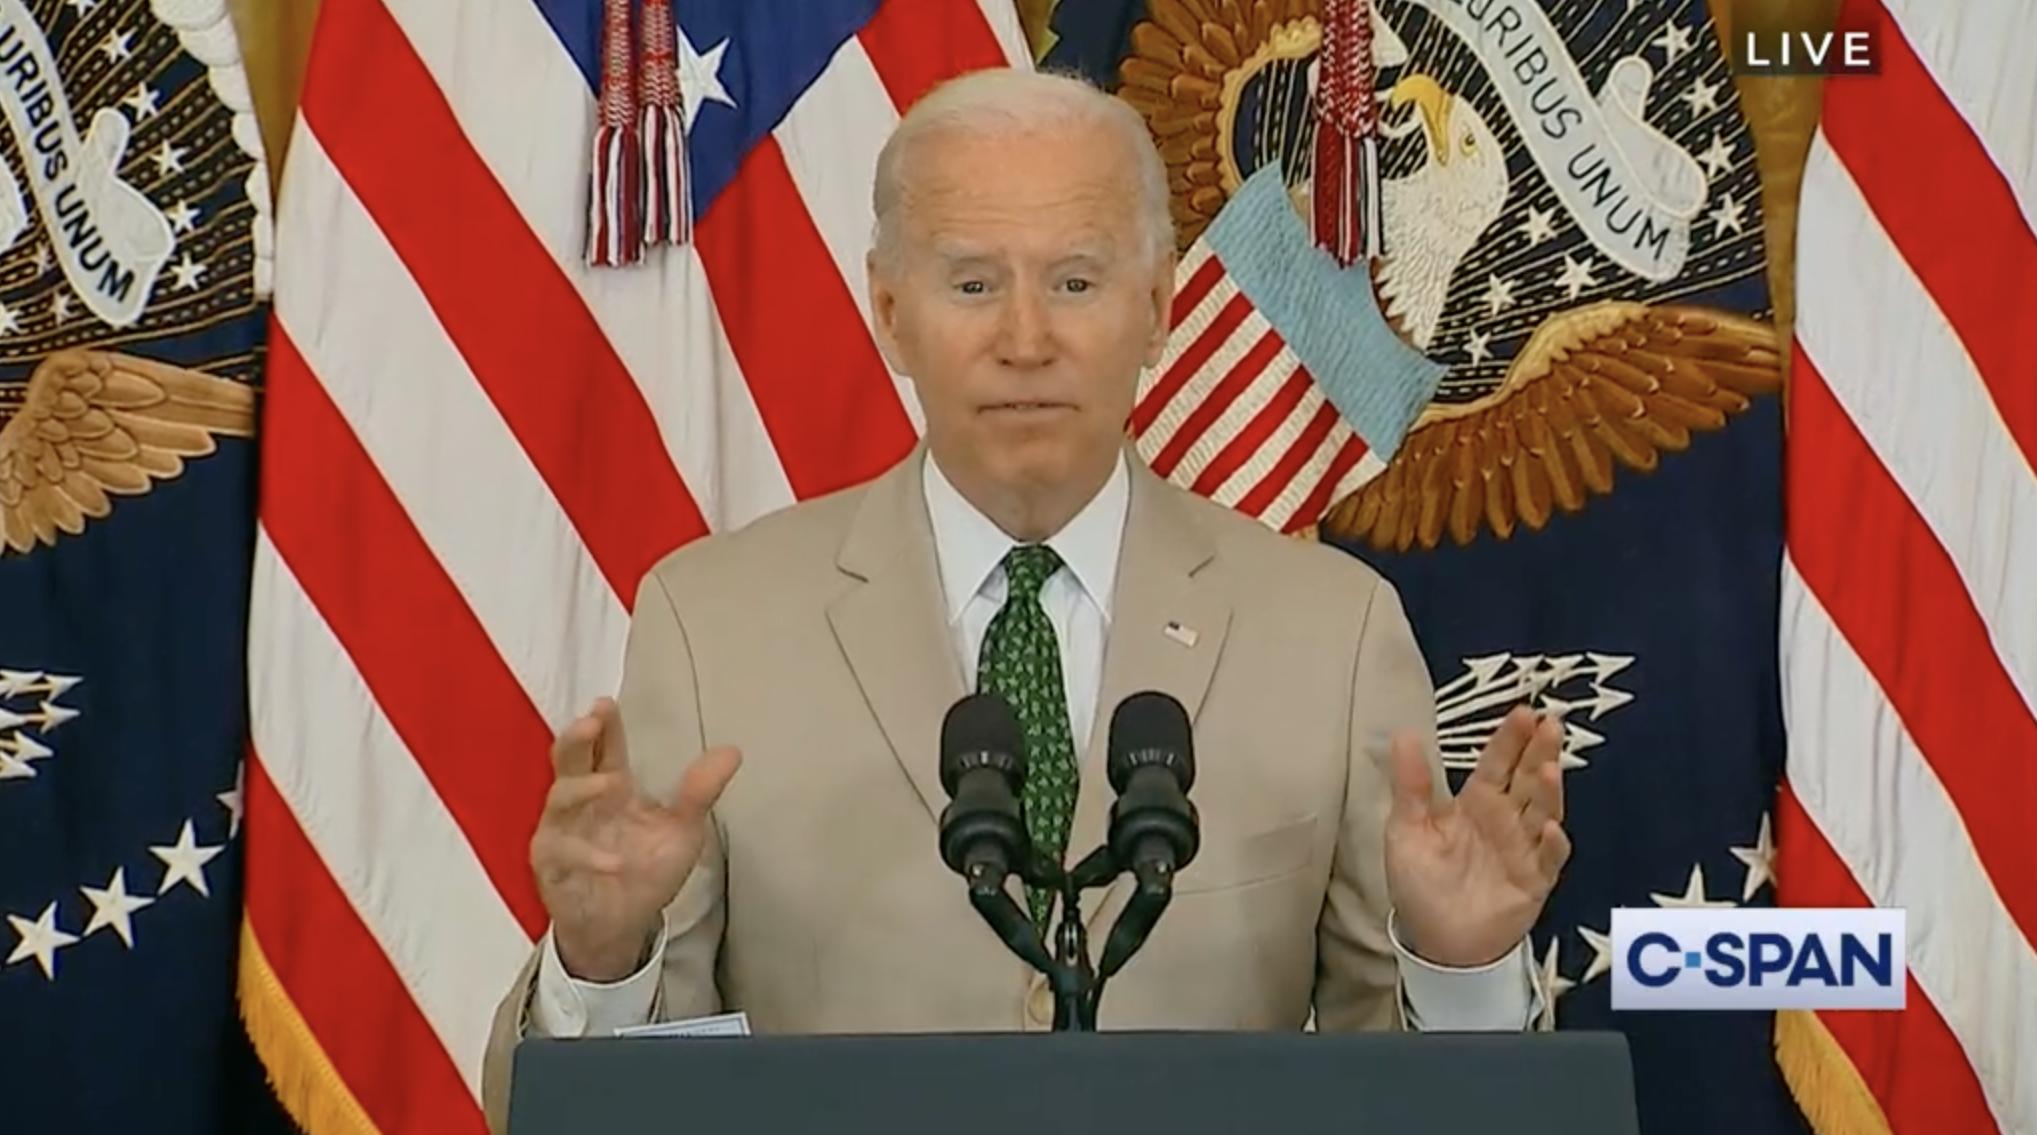 Screenshot of Joe Biden press conference on C-Span.